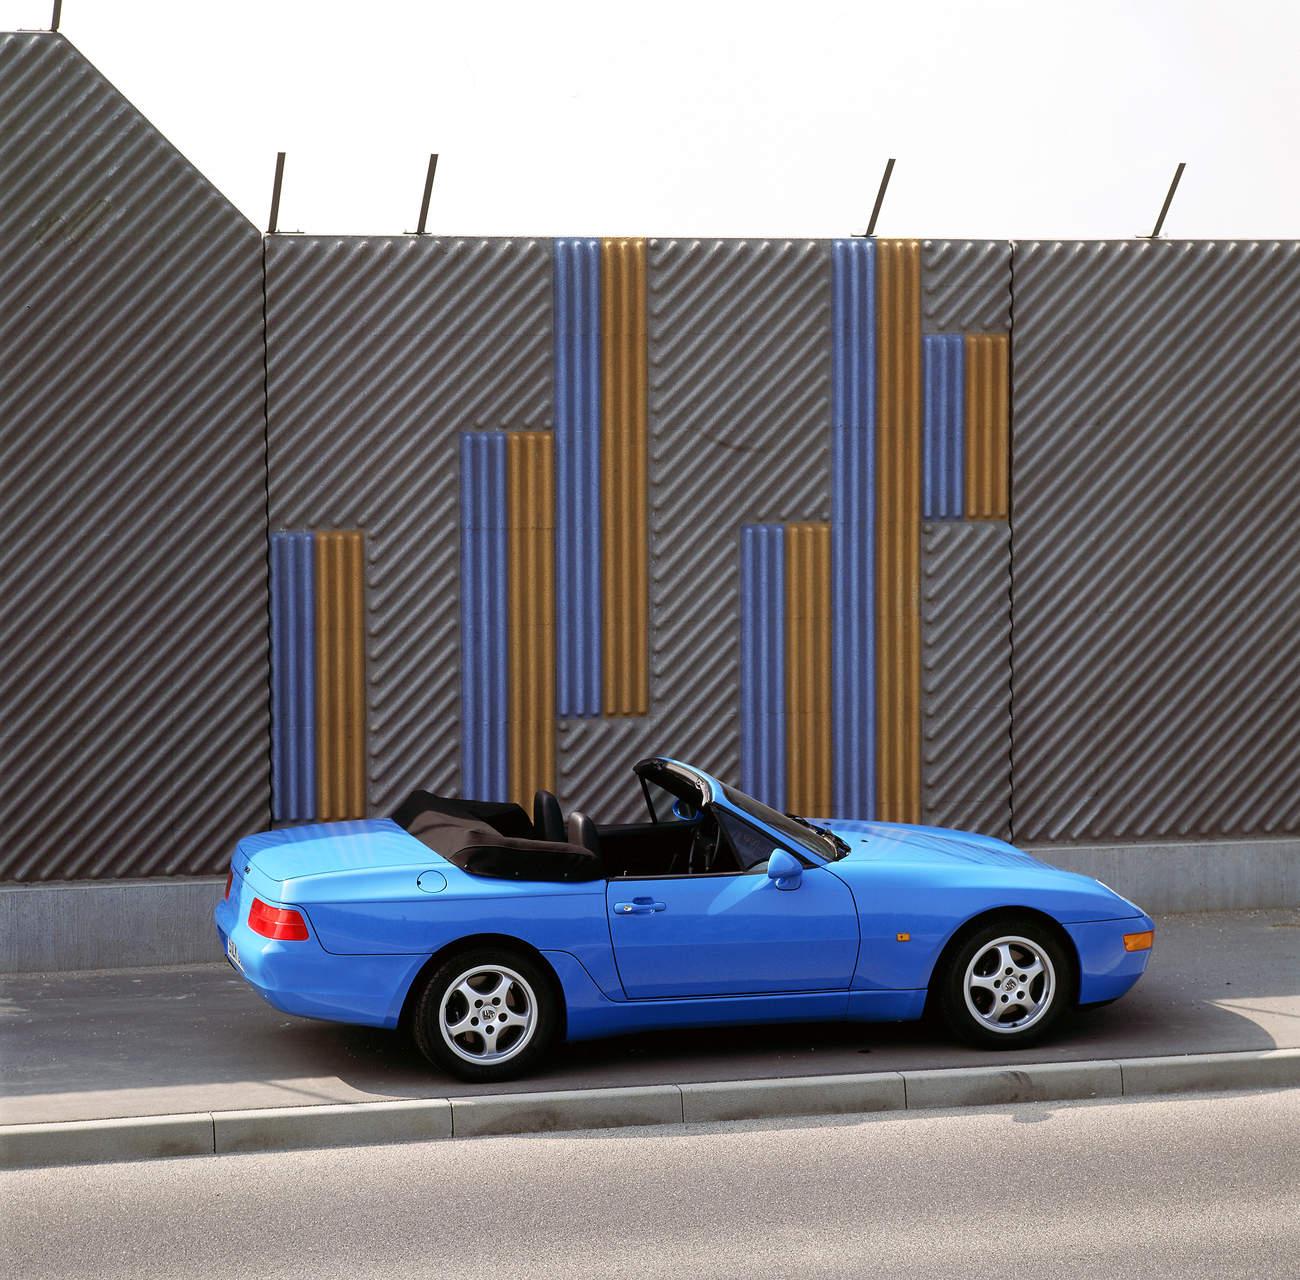 Foto: wheelsage.org